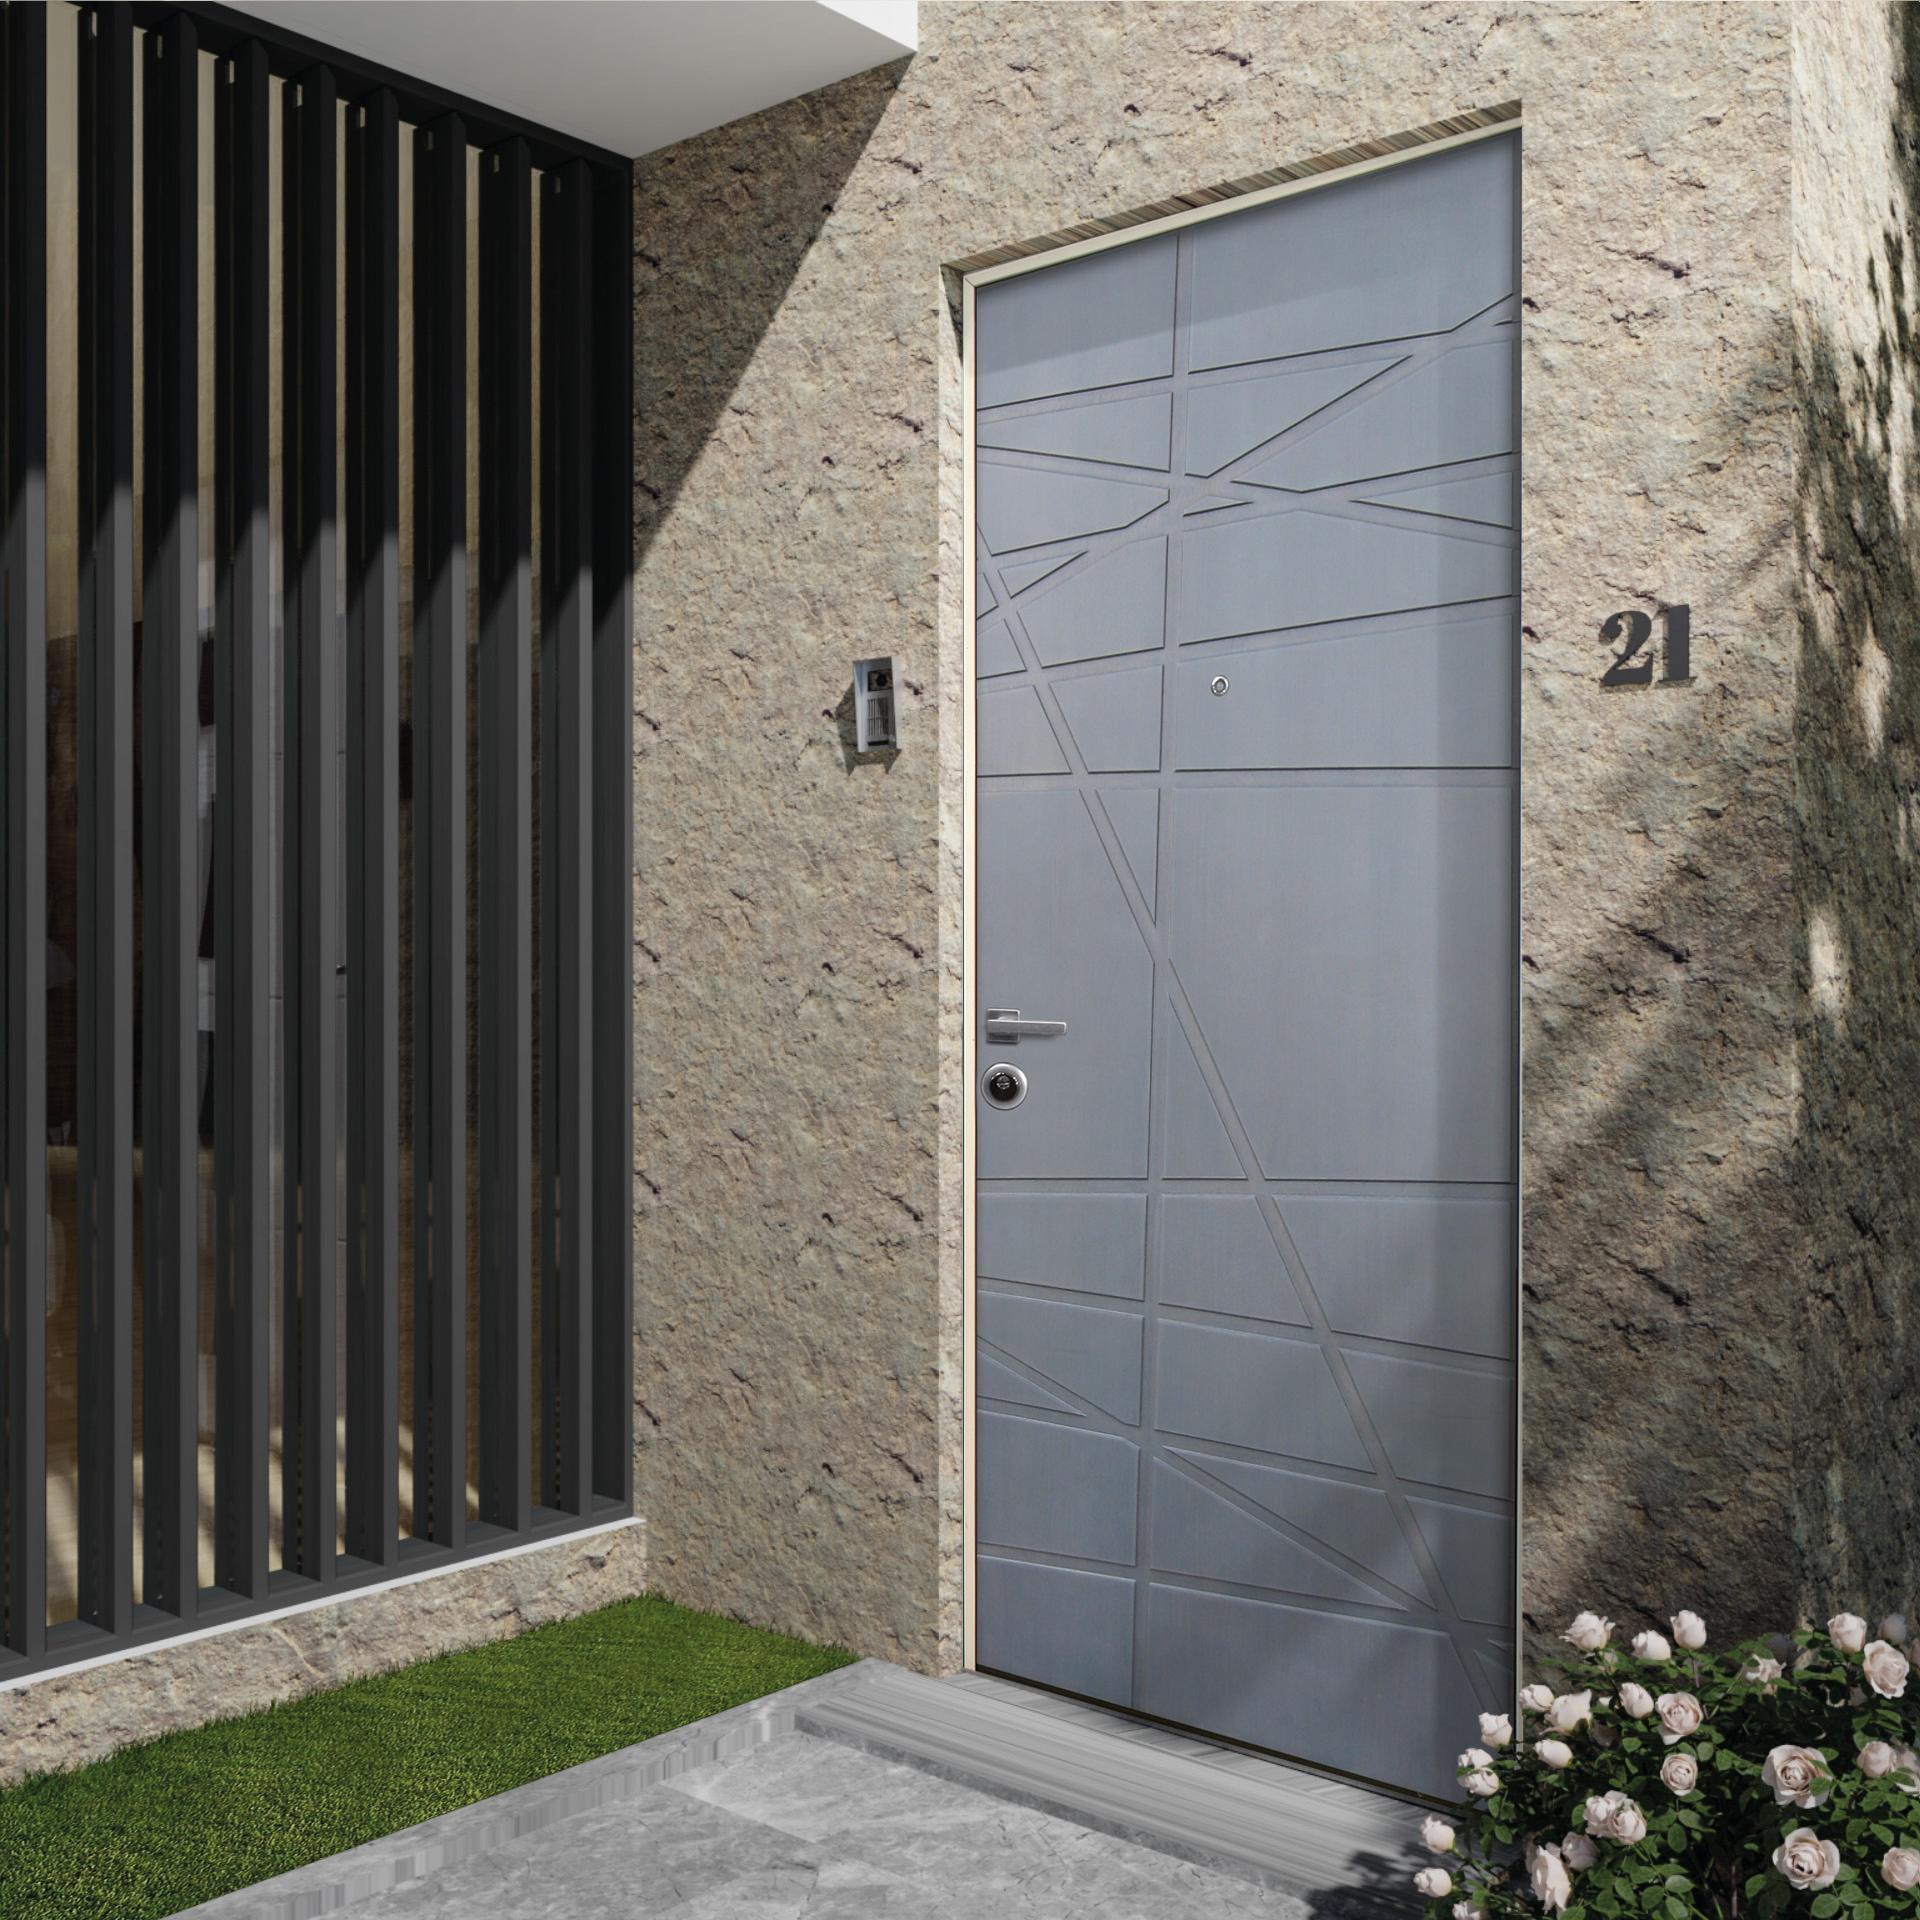 Porta blindata Invisible grigio L 90 x H 210 cm destra - 1